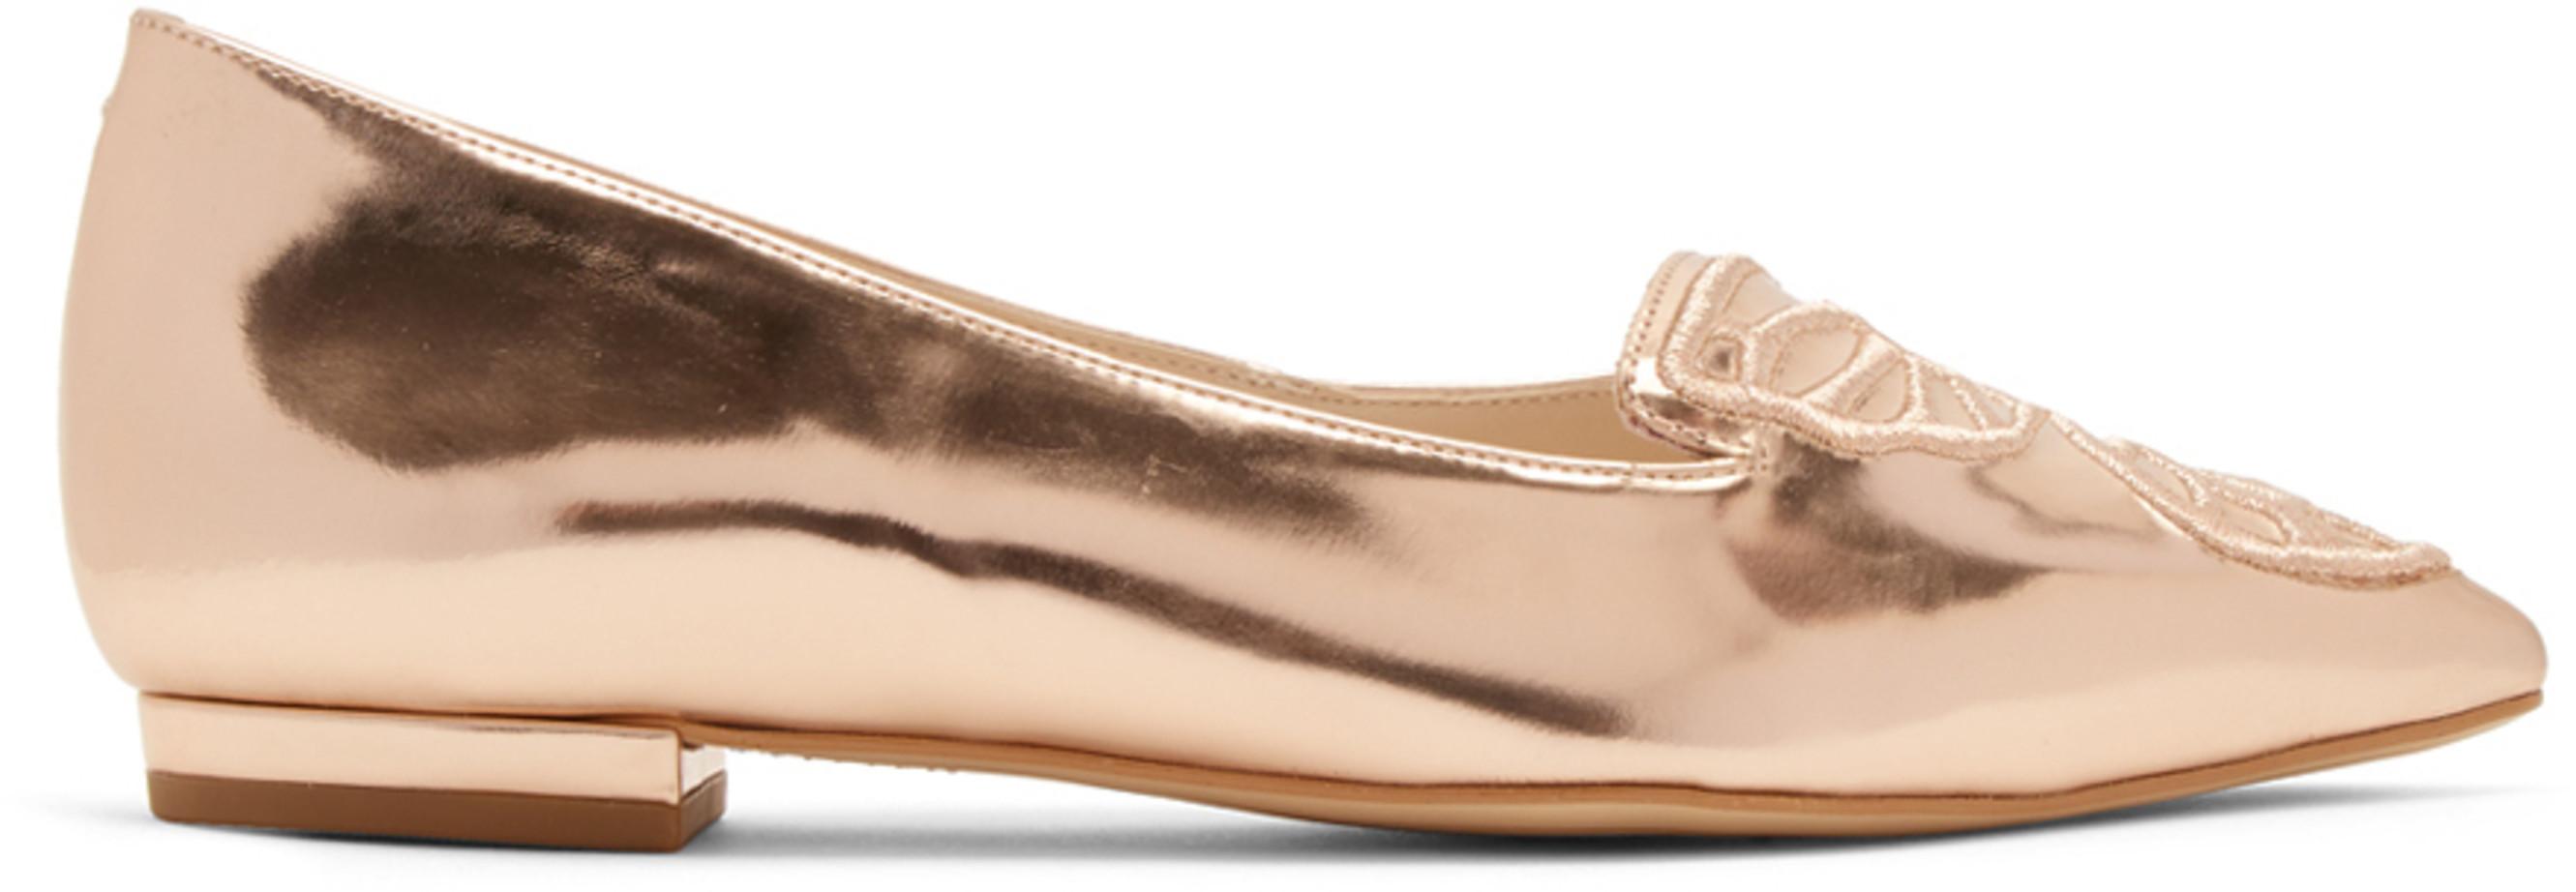 8c8e2df4eb79 Sophia Webster shoes for Women